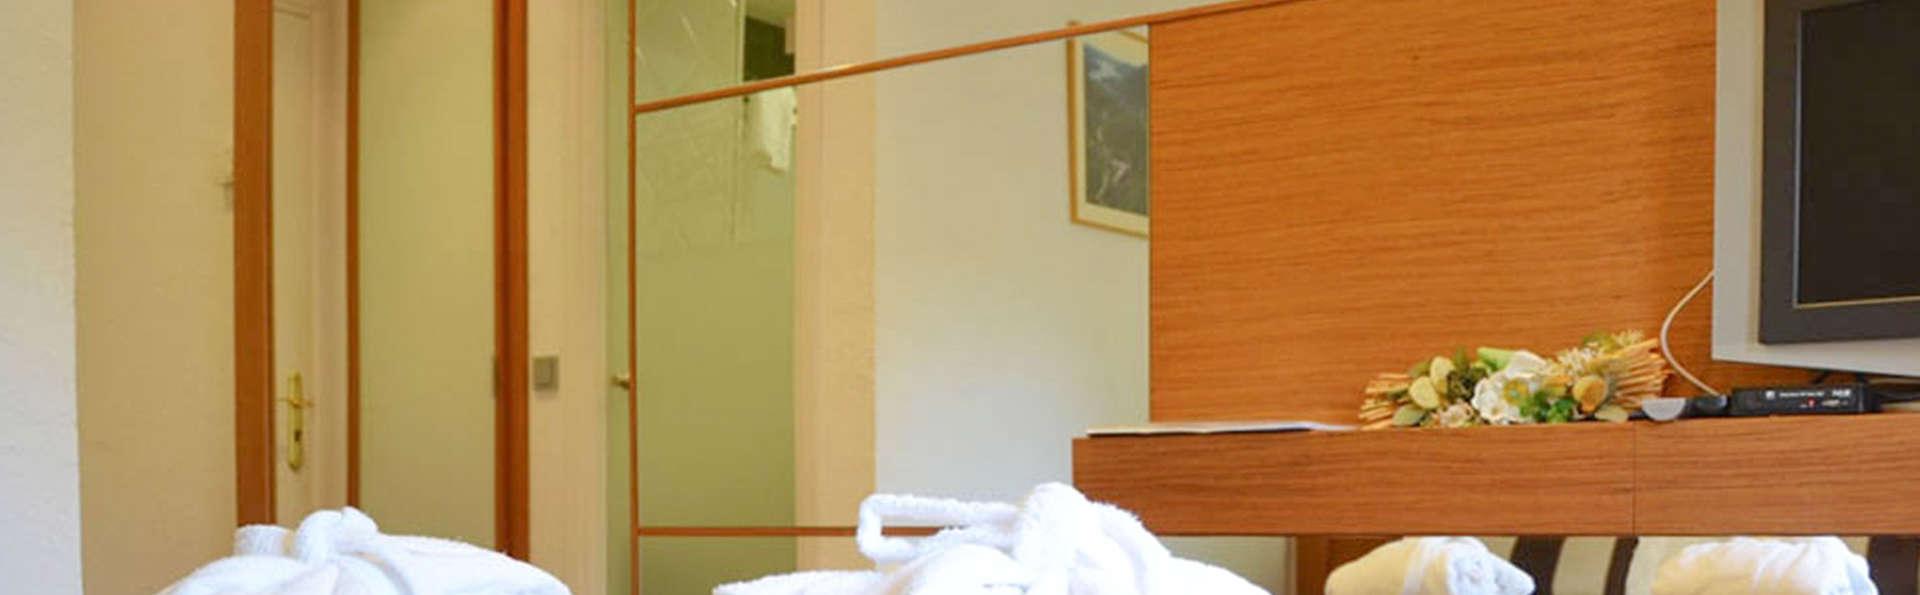 Hotel Spa La Central (Adults Only) - EDIT_estandard_02.jpg